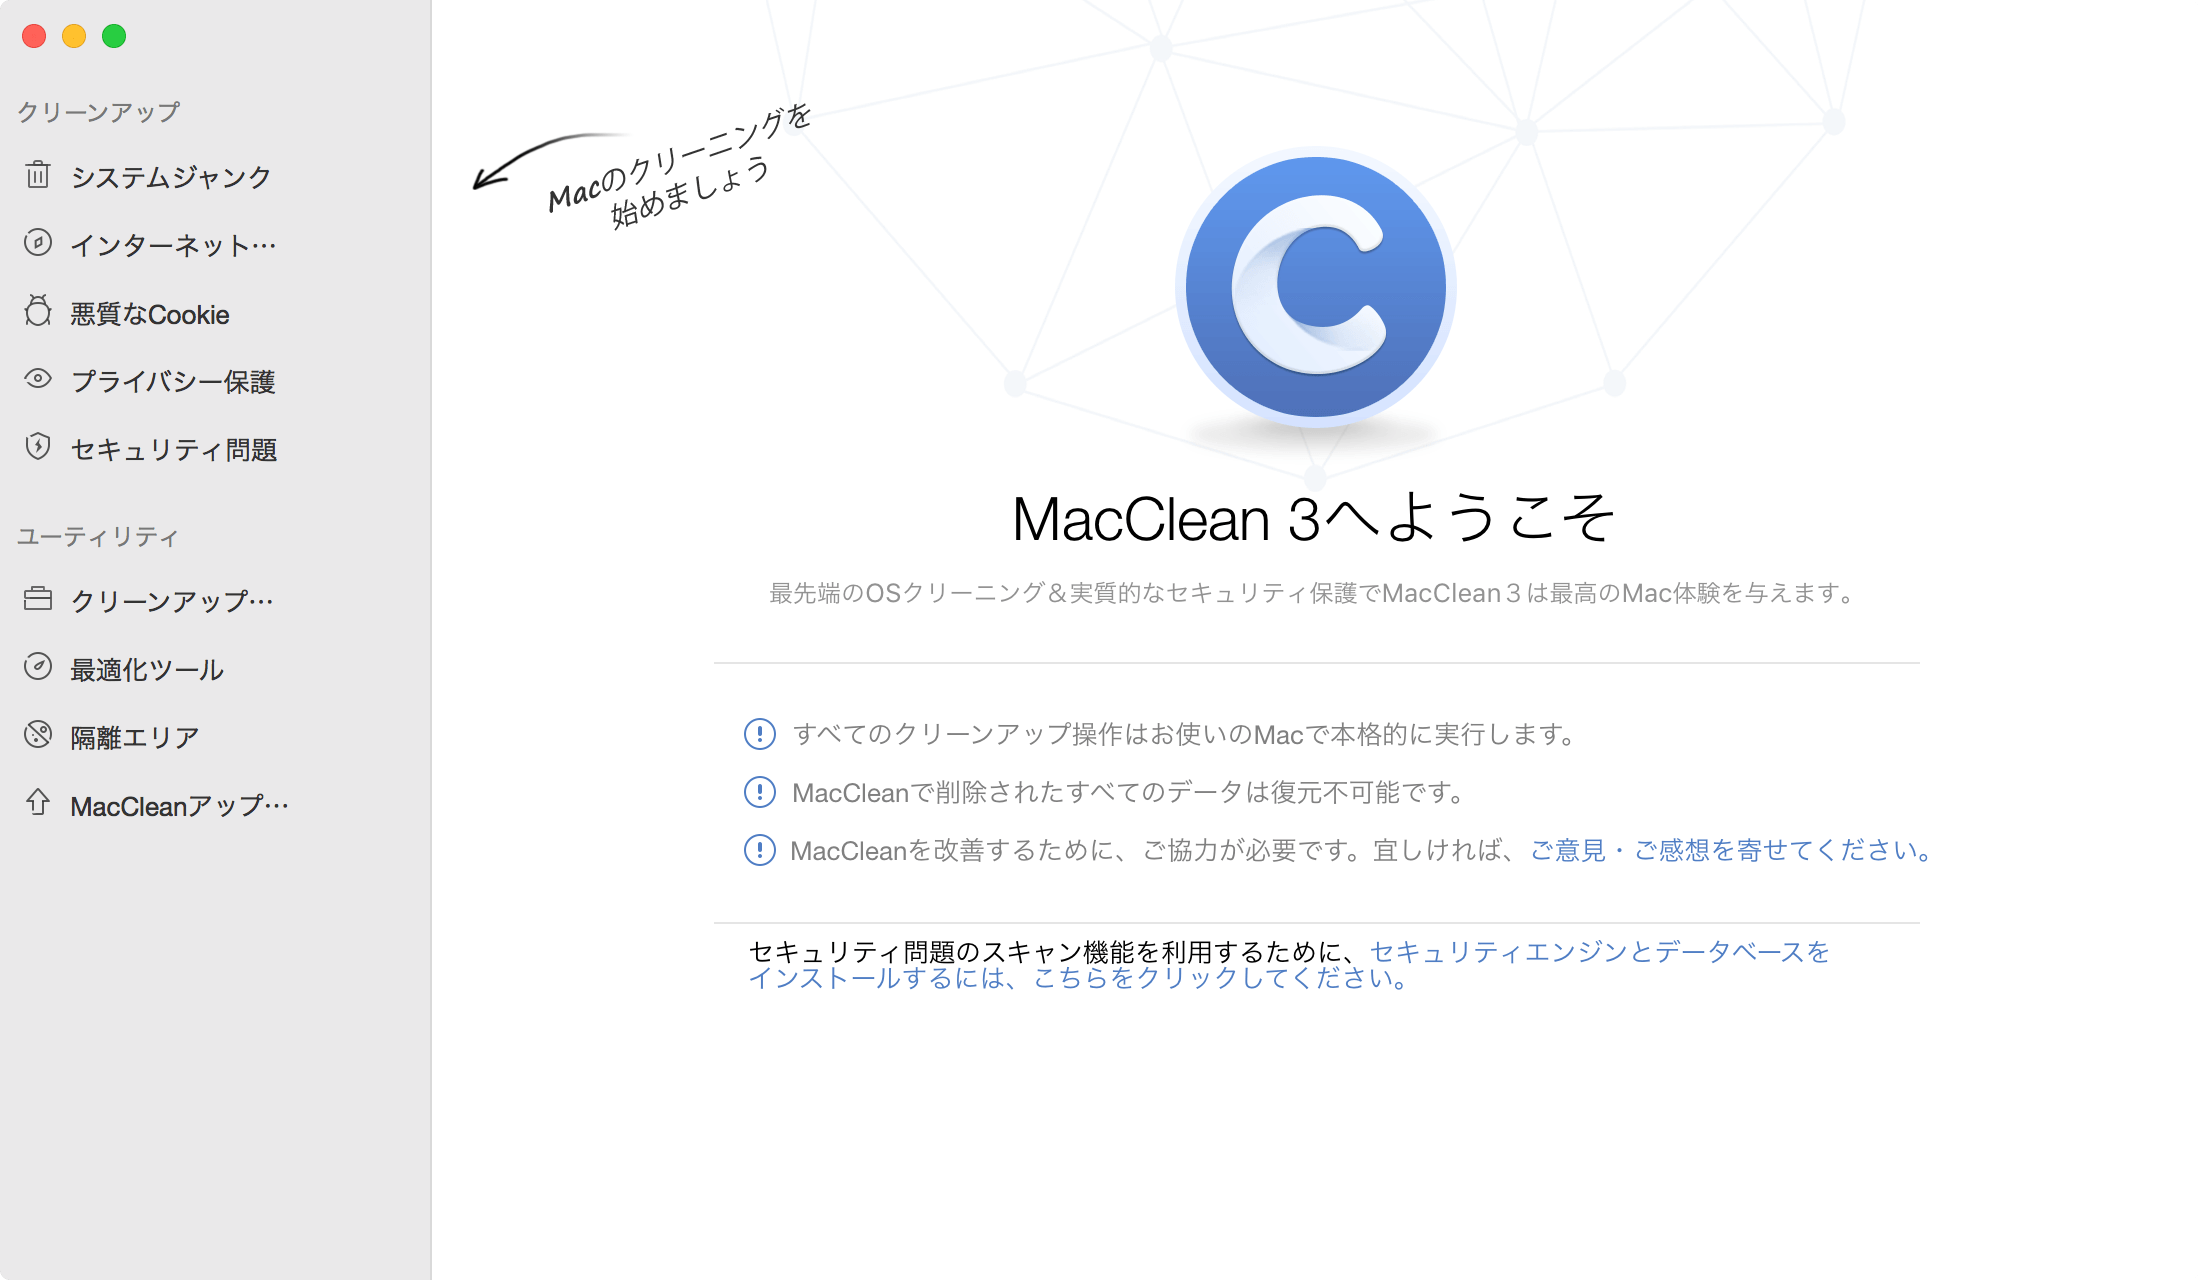 005_20160426_macclean